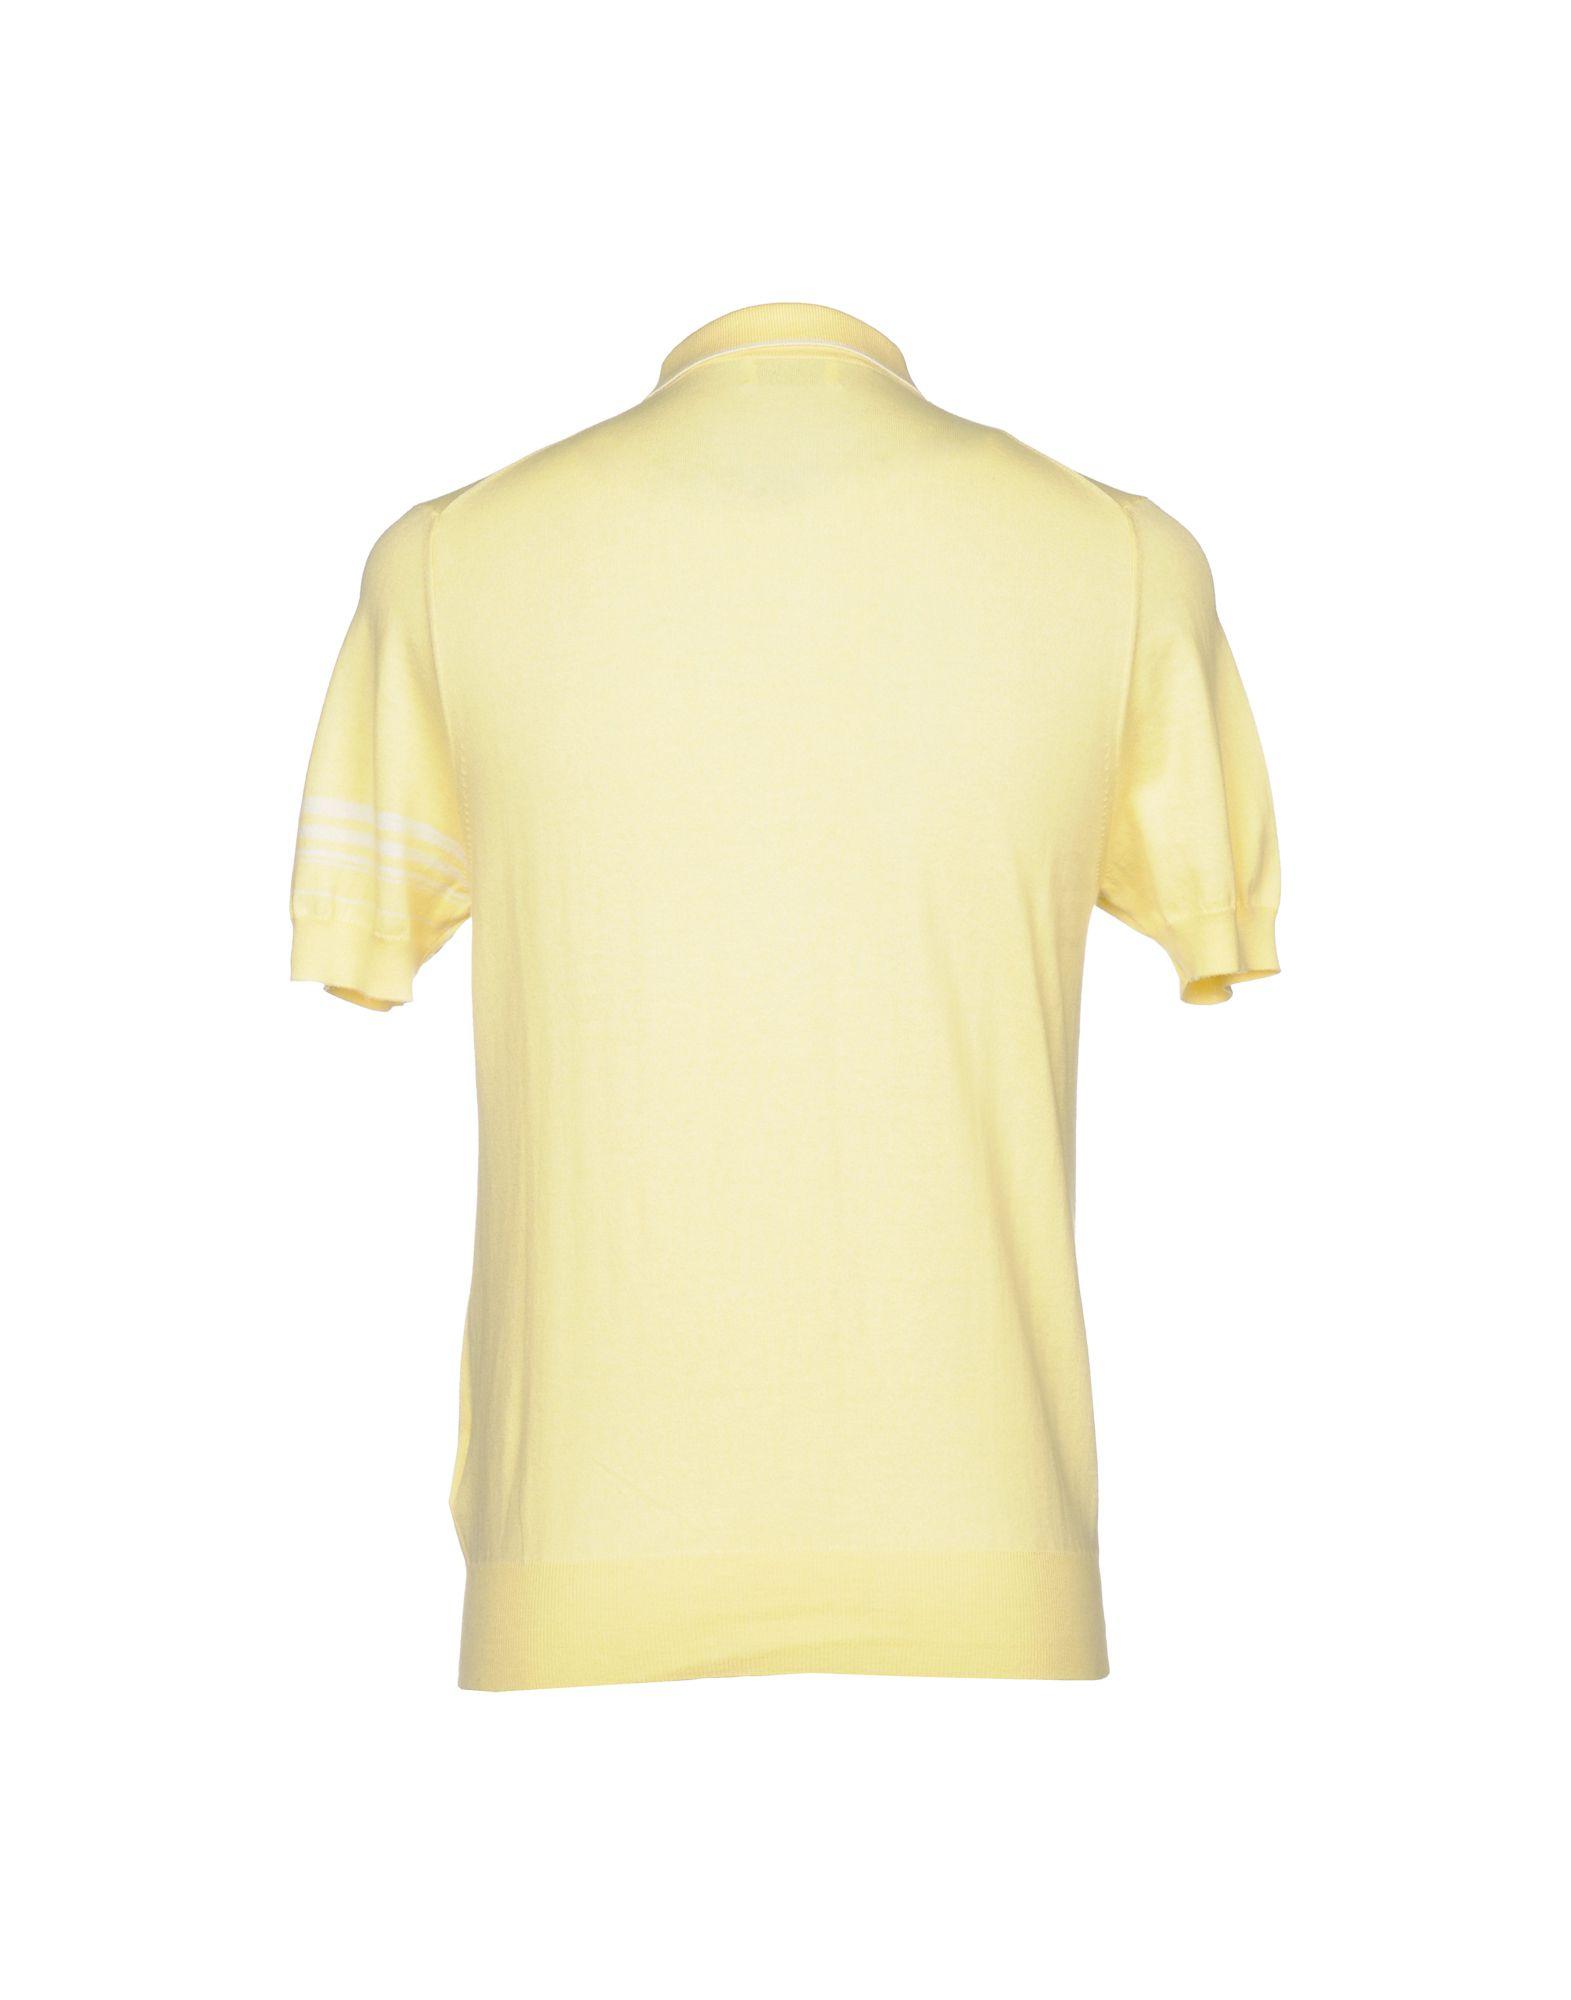 A buon mercato Pullover 39706027QD Ballantyne Uomo - 39706027QD Pullover bb9875